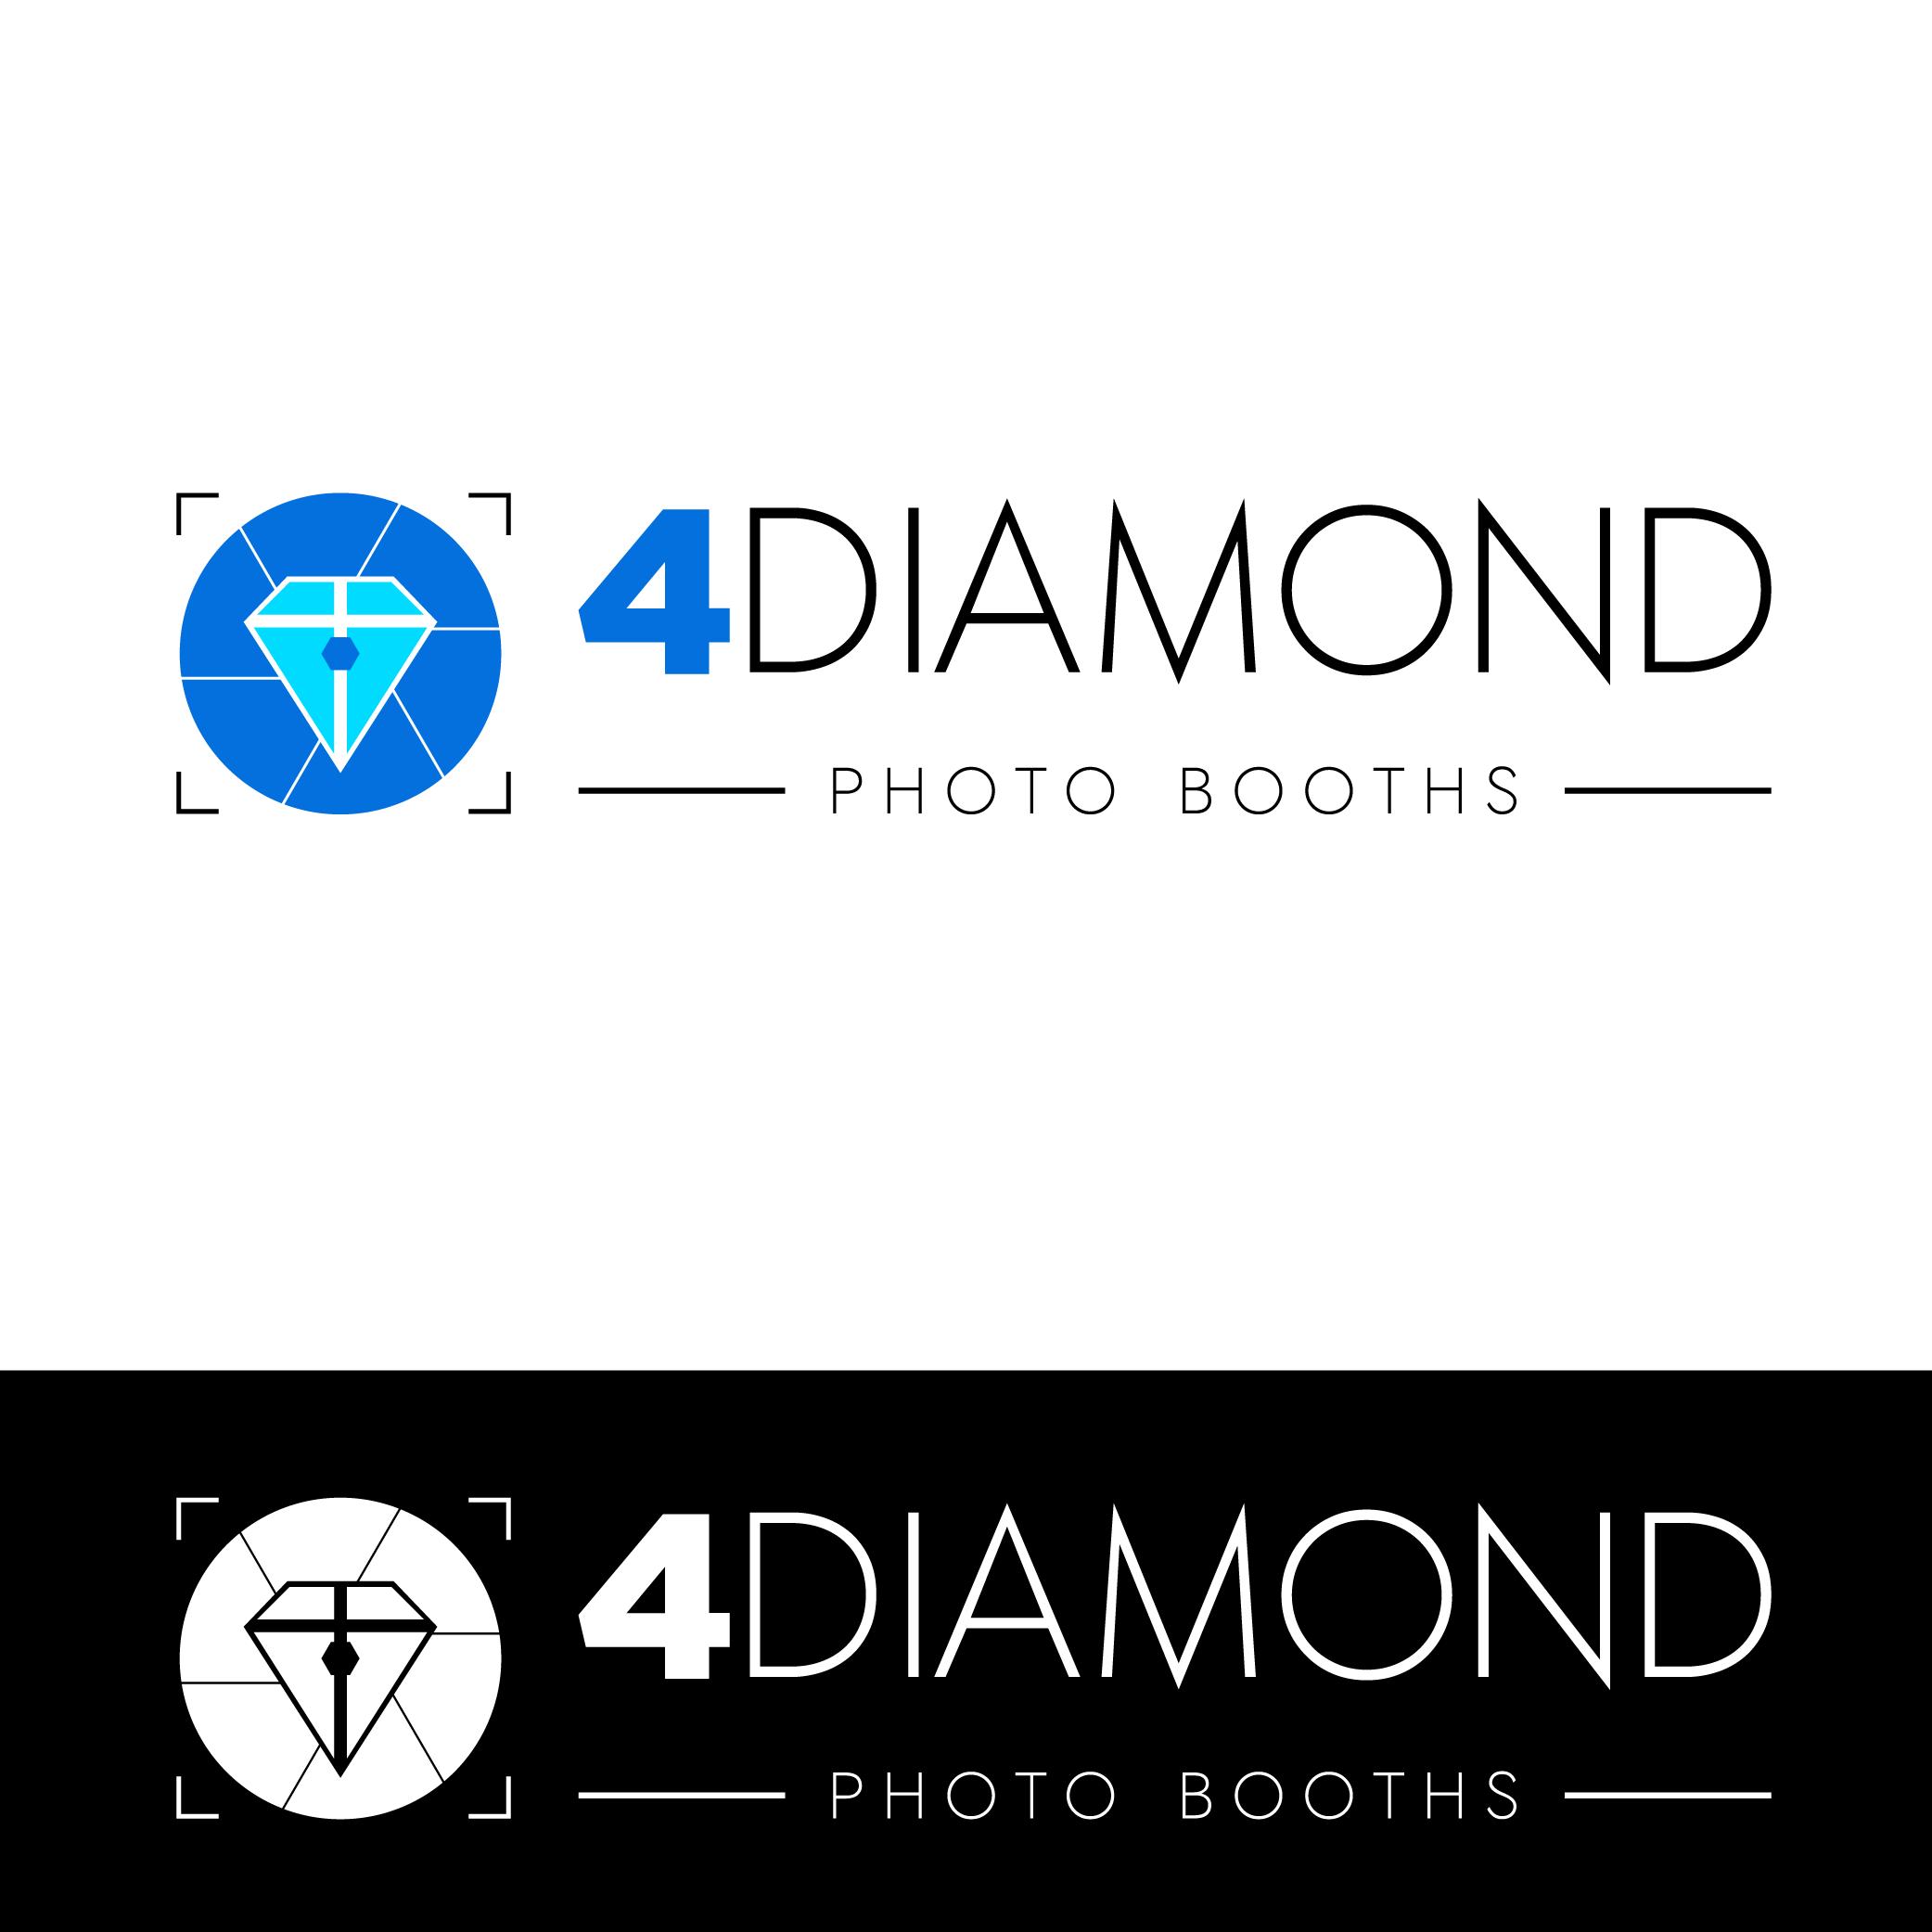 Logo Design by Private User - Entry No. 25 in the Logo Design Contest Creative Logo Design for 4 Diamond Photo Booths.